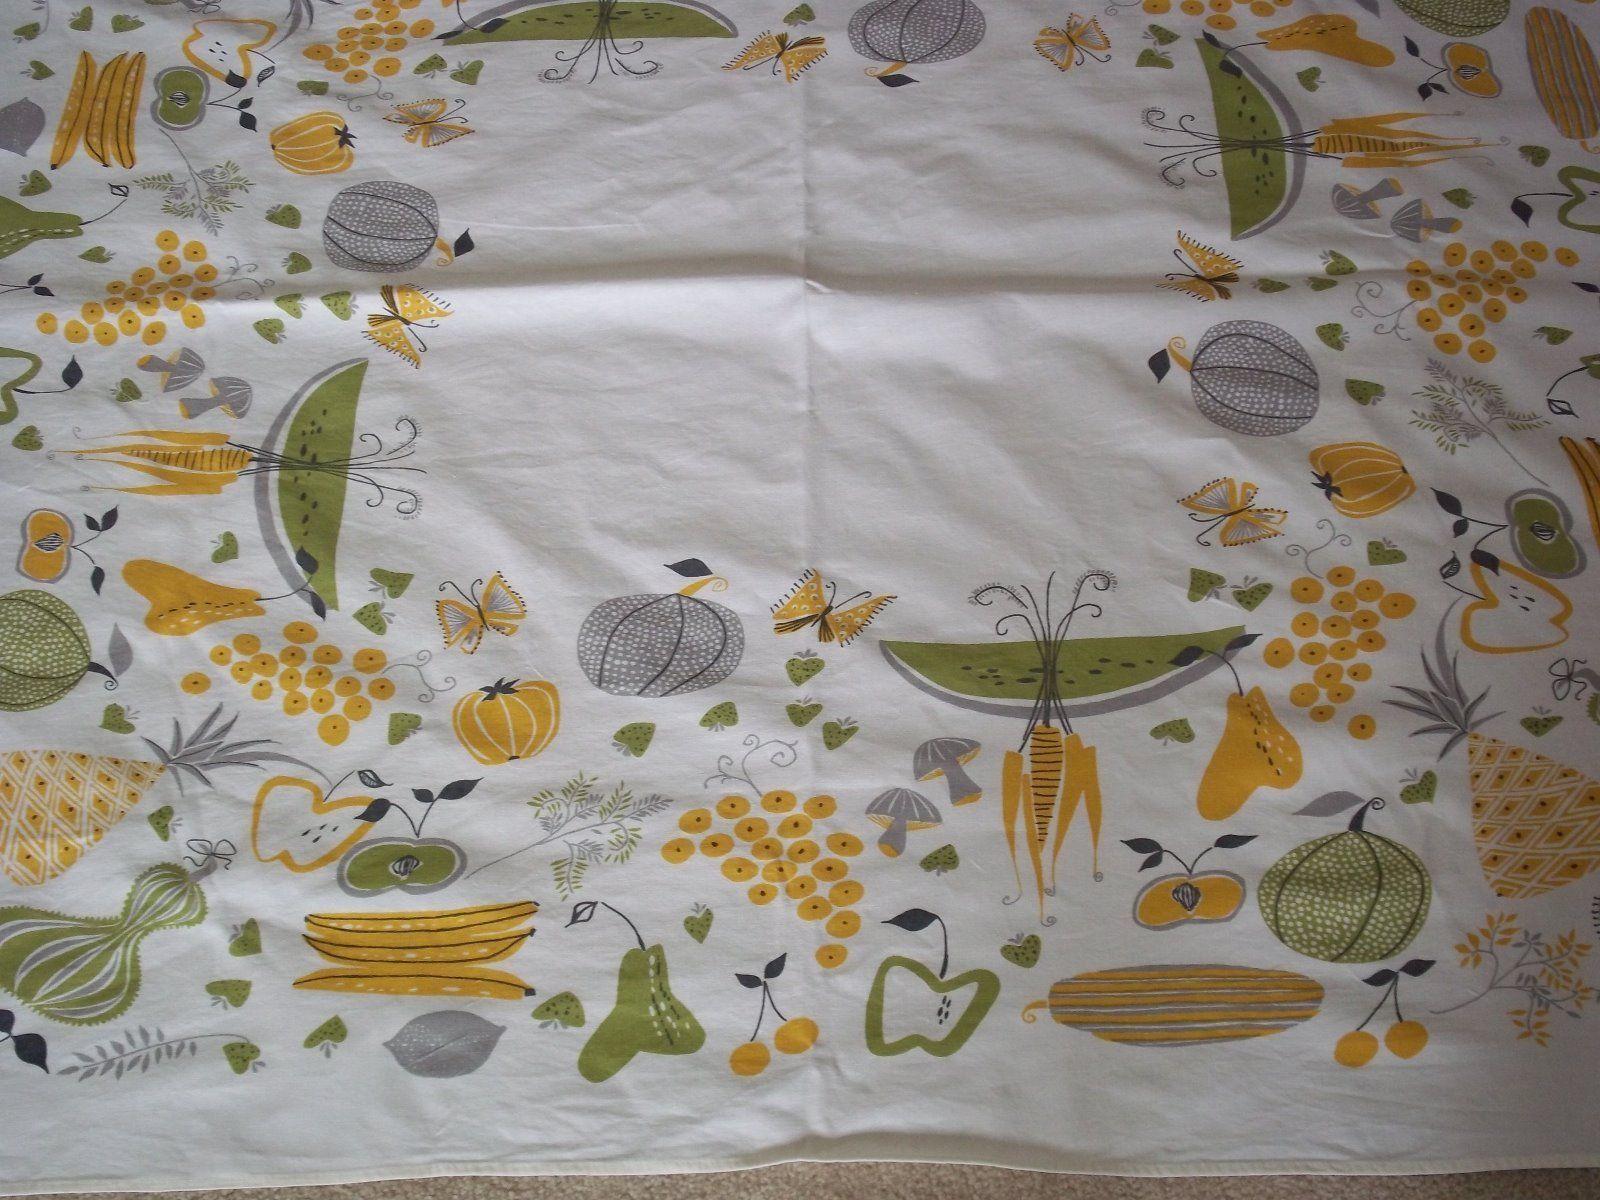 Vintage tablecloth by Pat Prichard mid century modern retro green